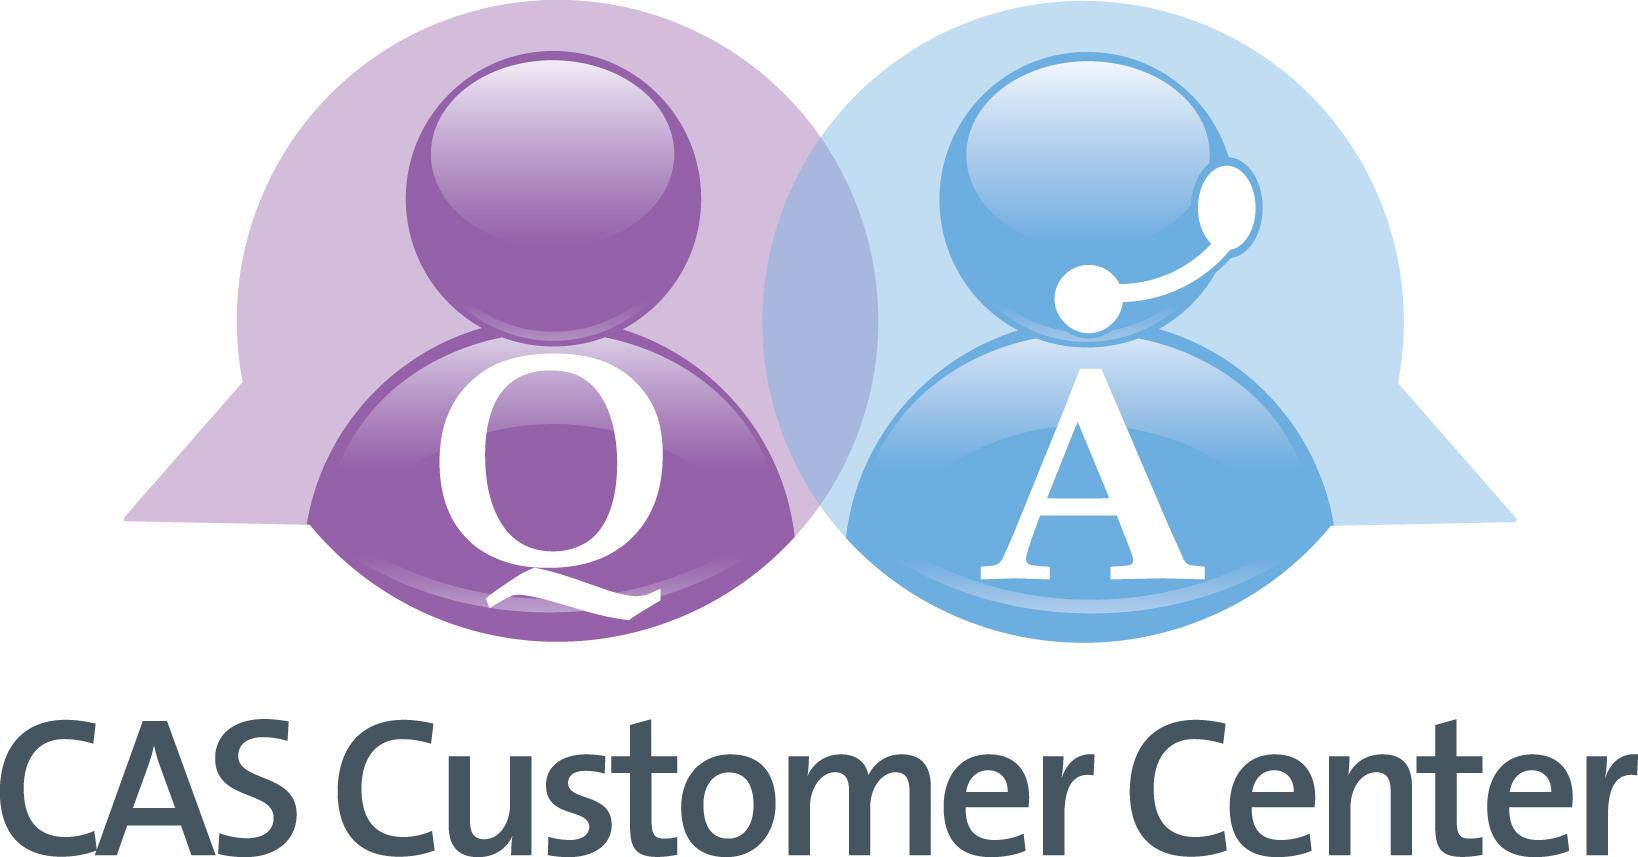 CAS Customer Center Logo-hi